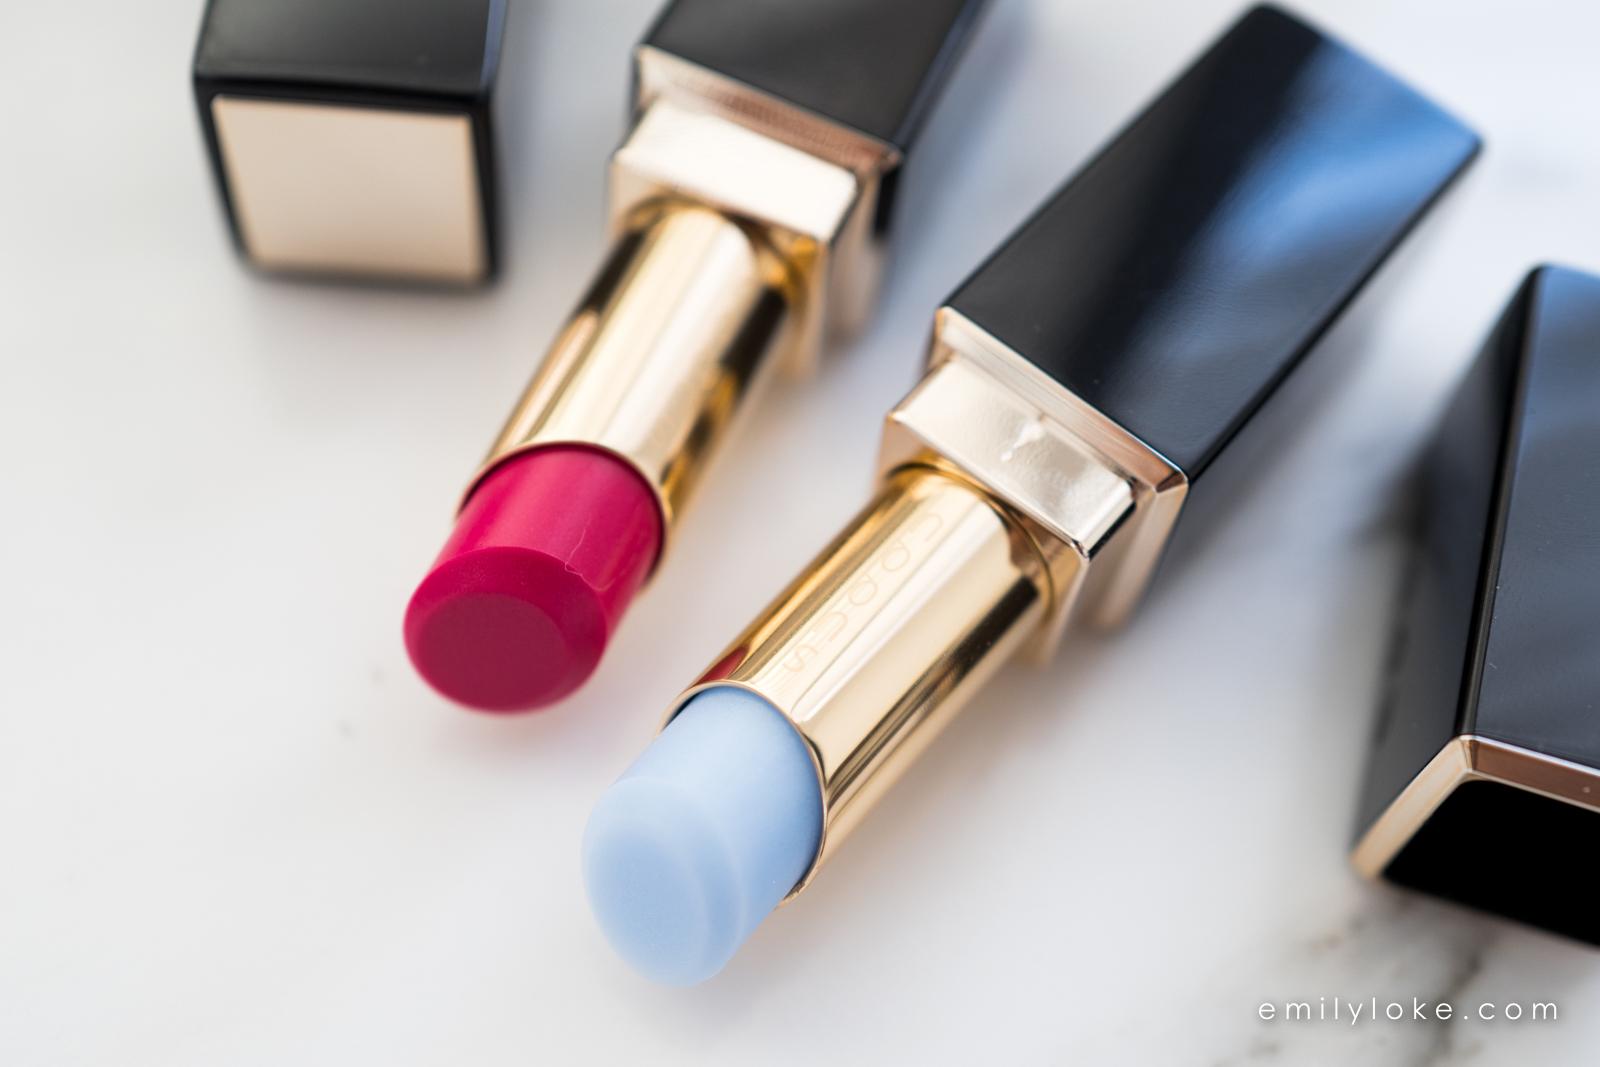 suqqu moisture rich lipsticks 2